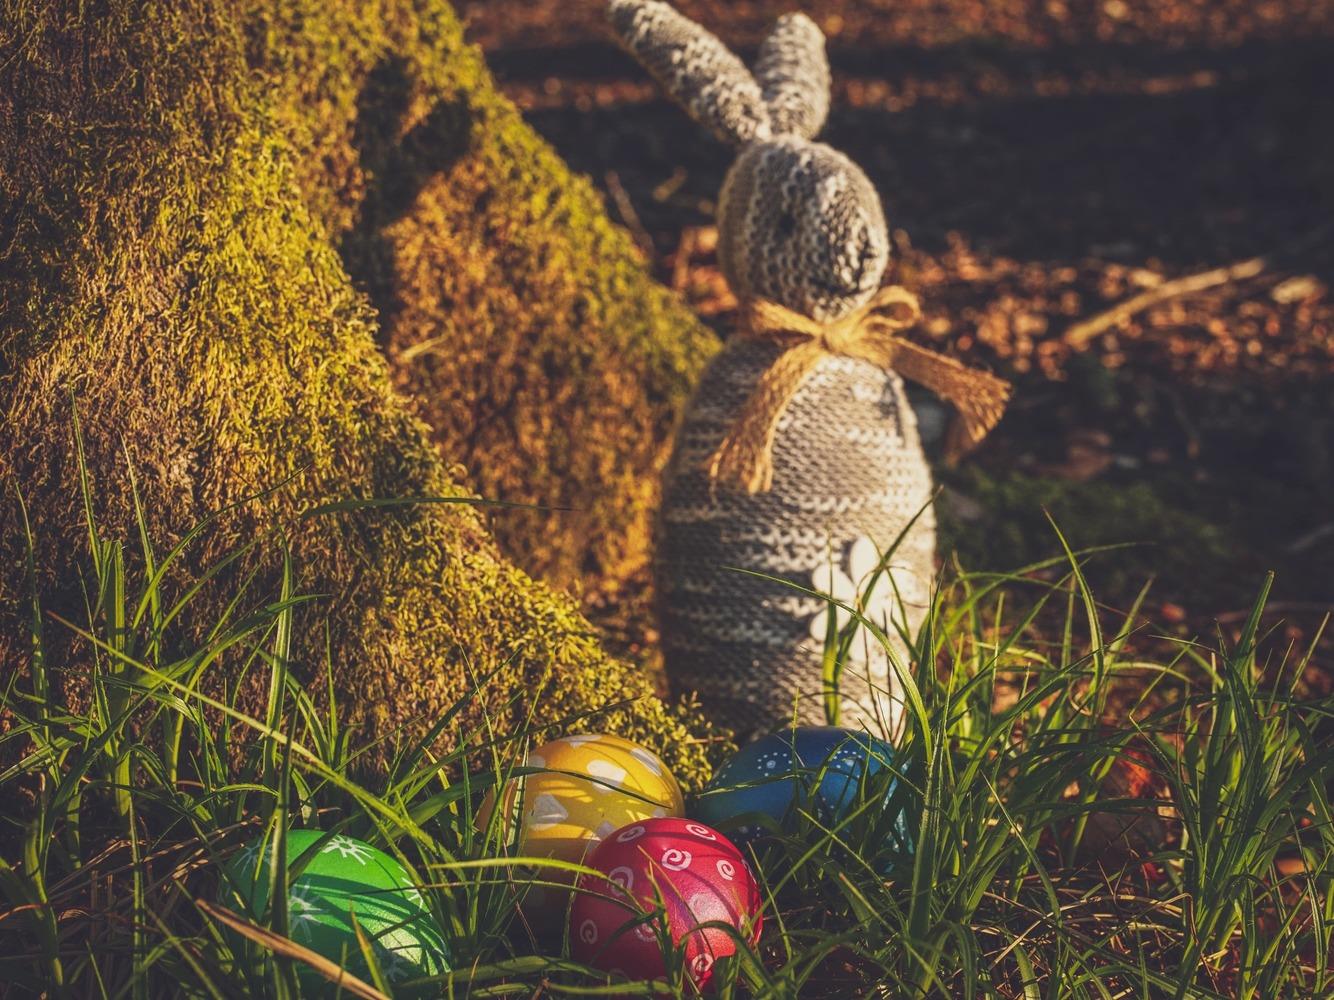 Dagje weg Pasen met kinderen